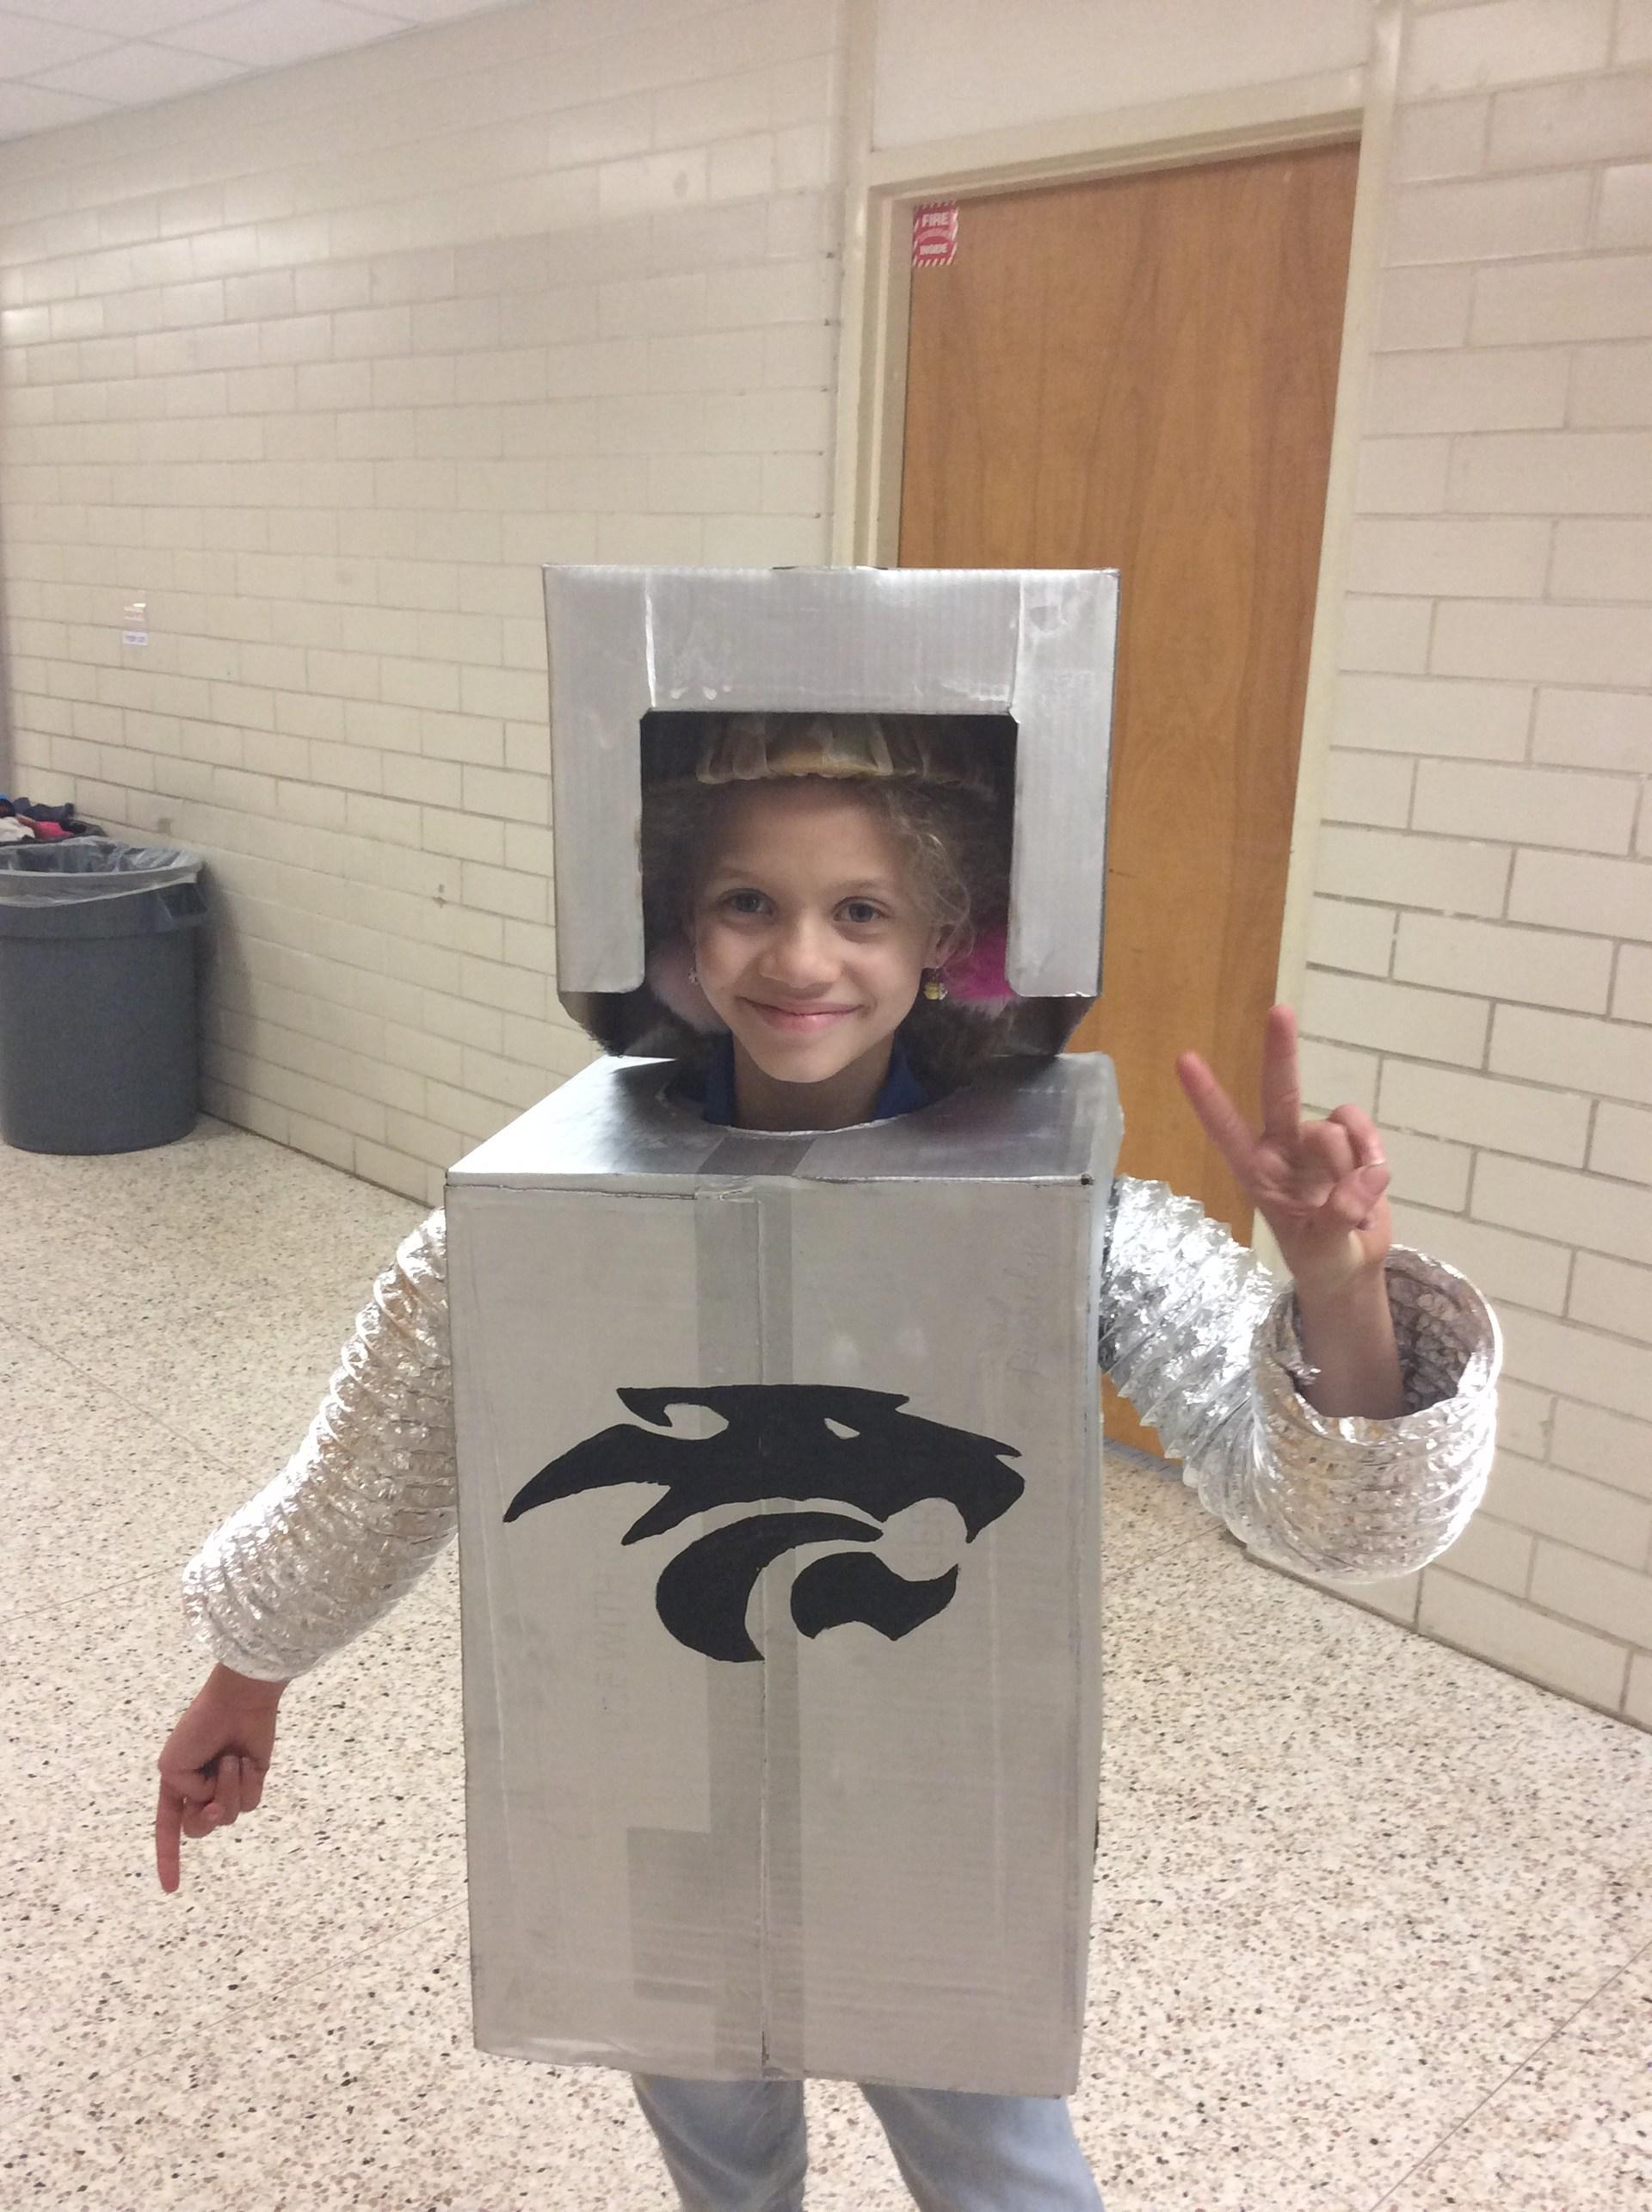 Robotics student posing